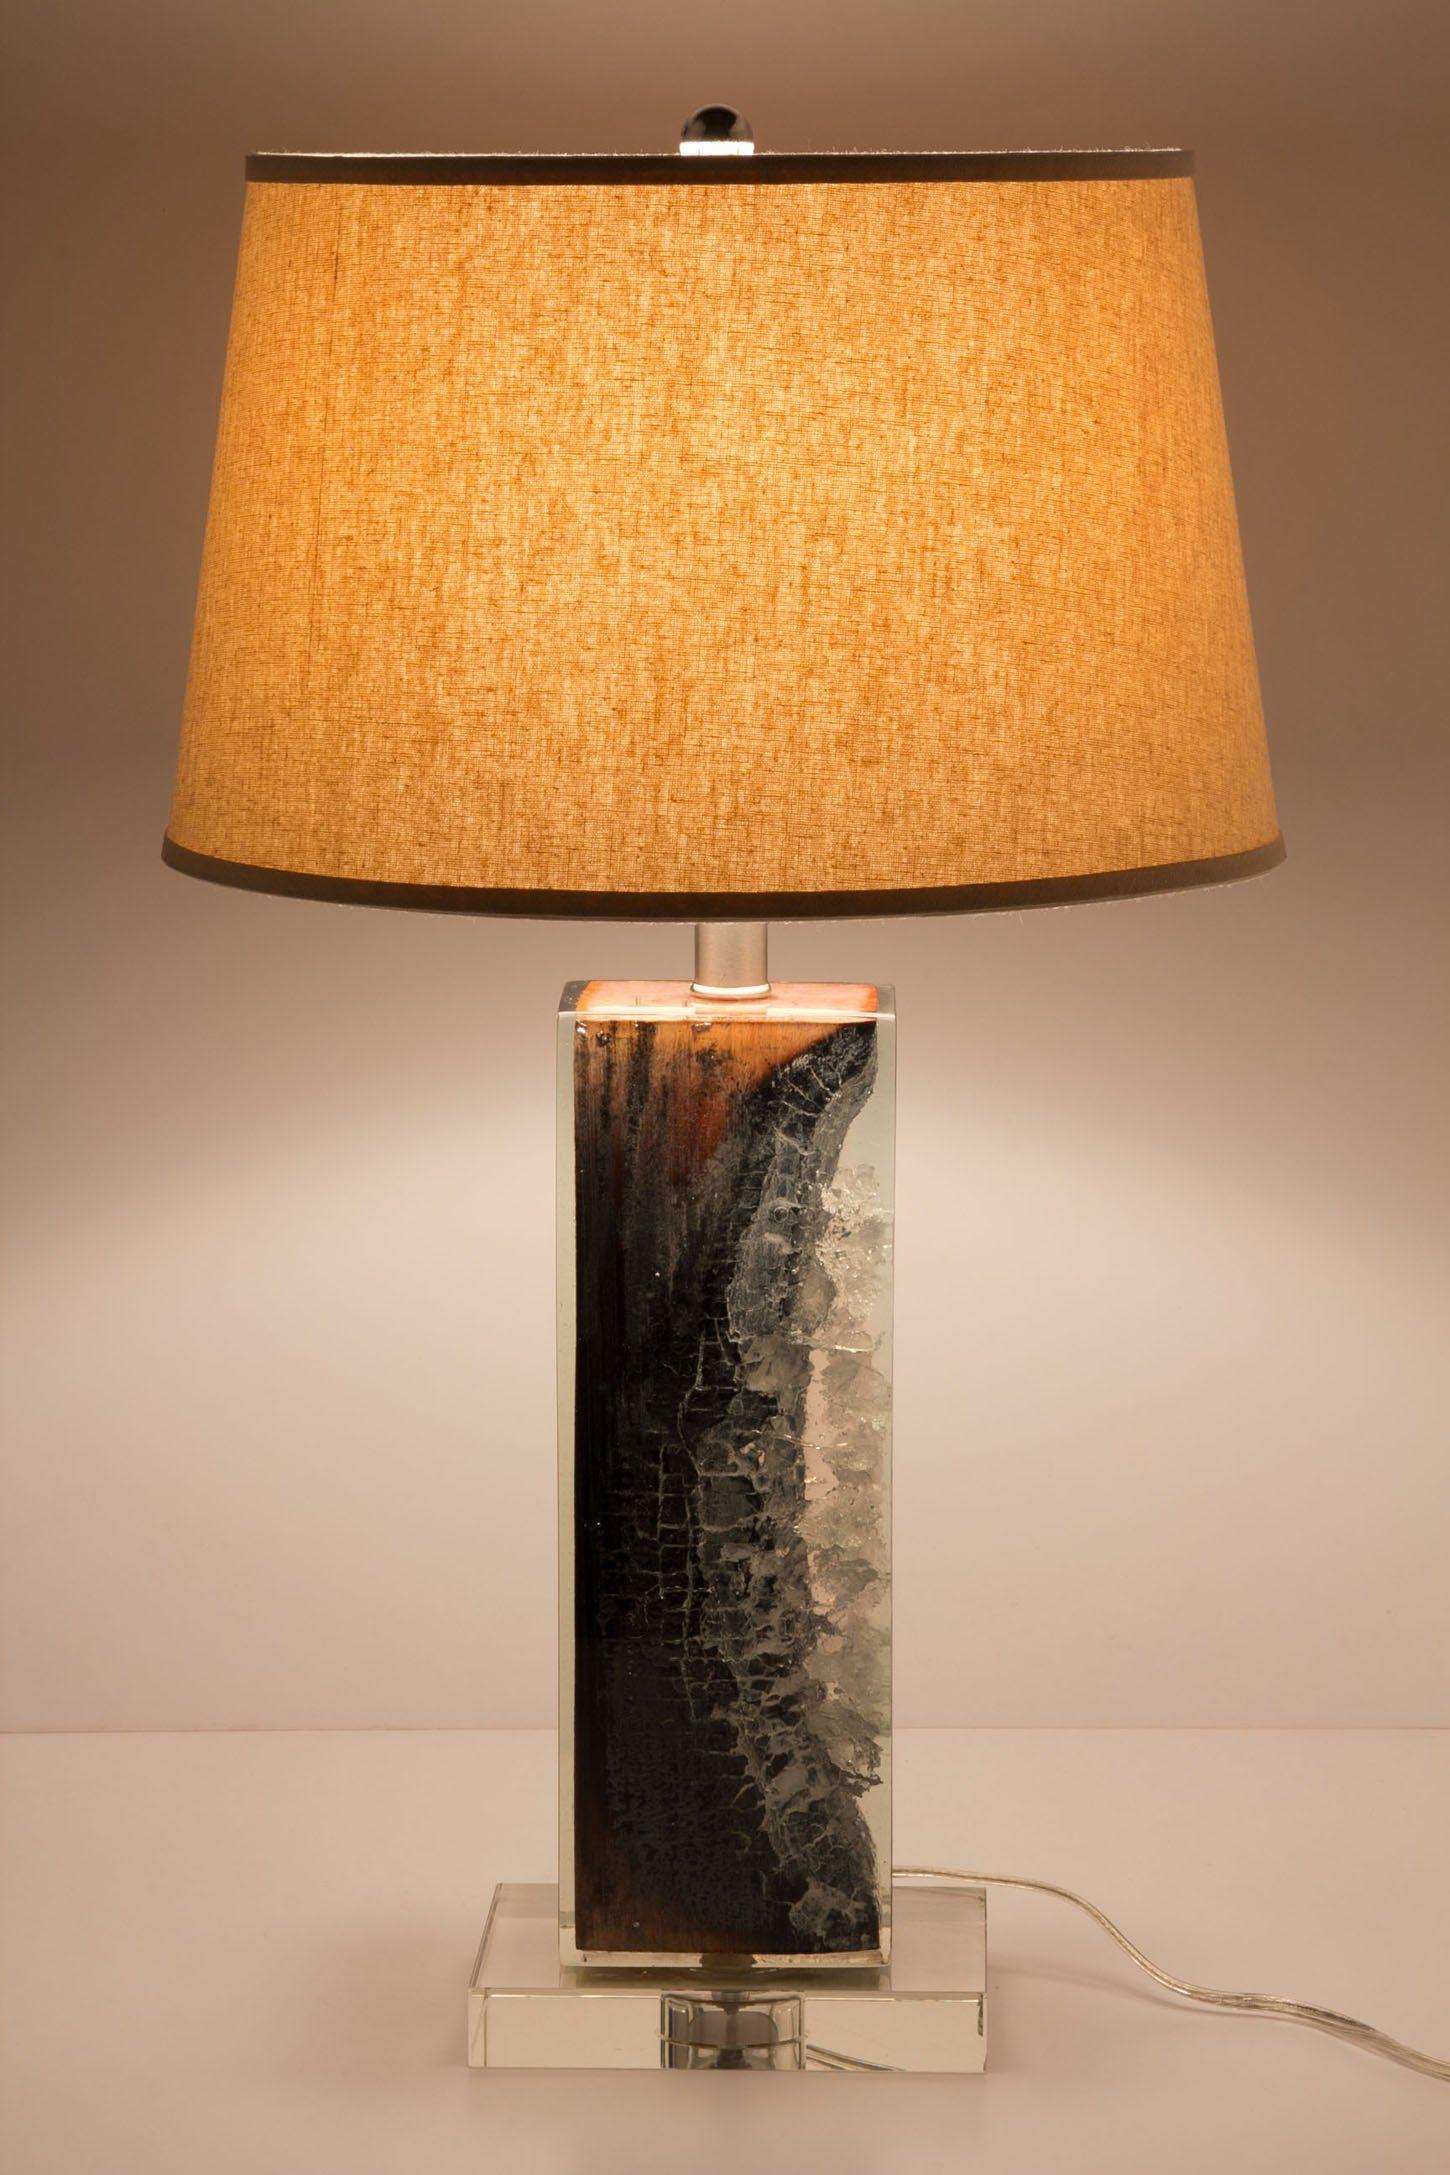 scorched timber lamp base diy furniture wood lamp base lamp rh pinterest com